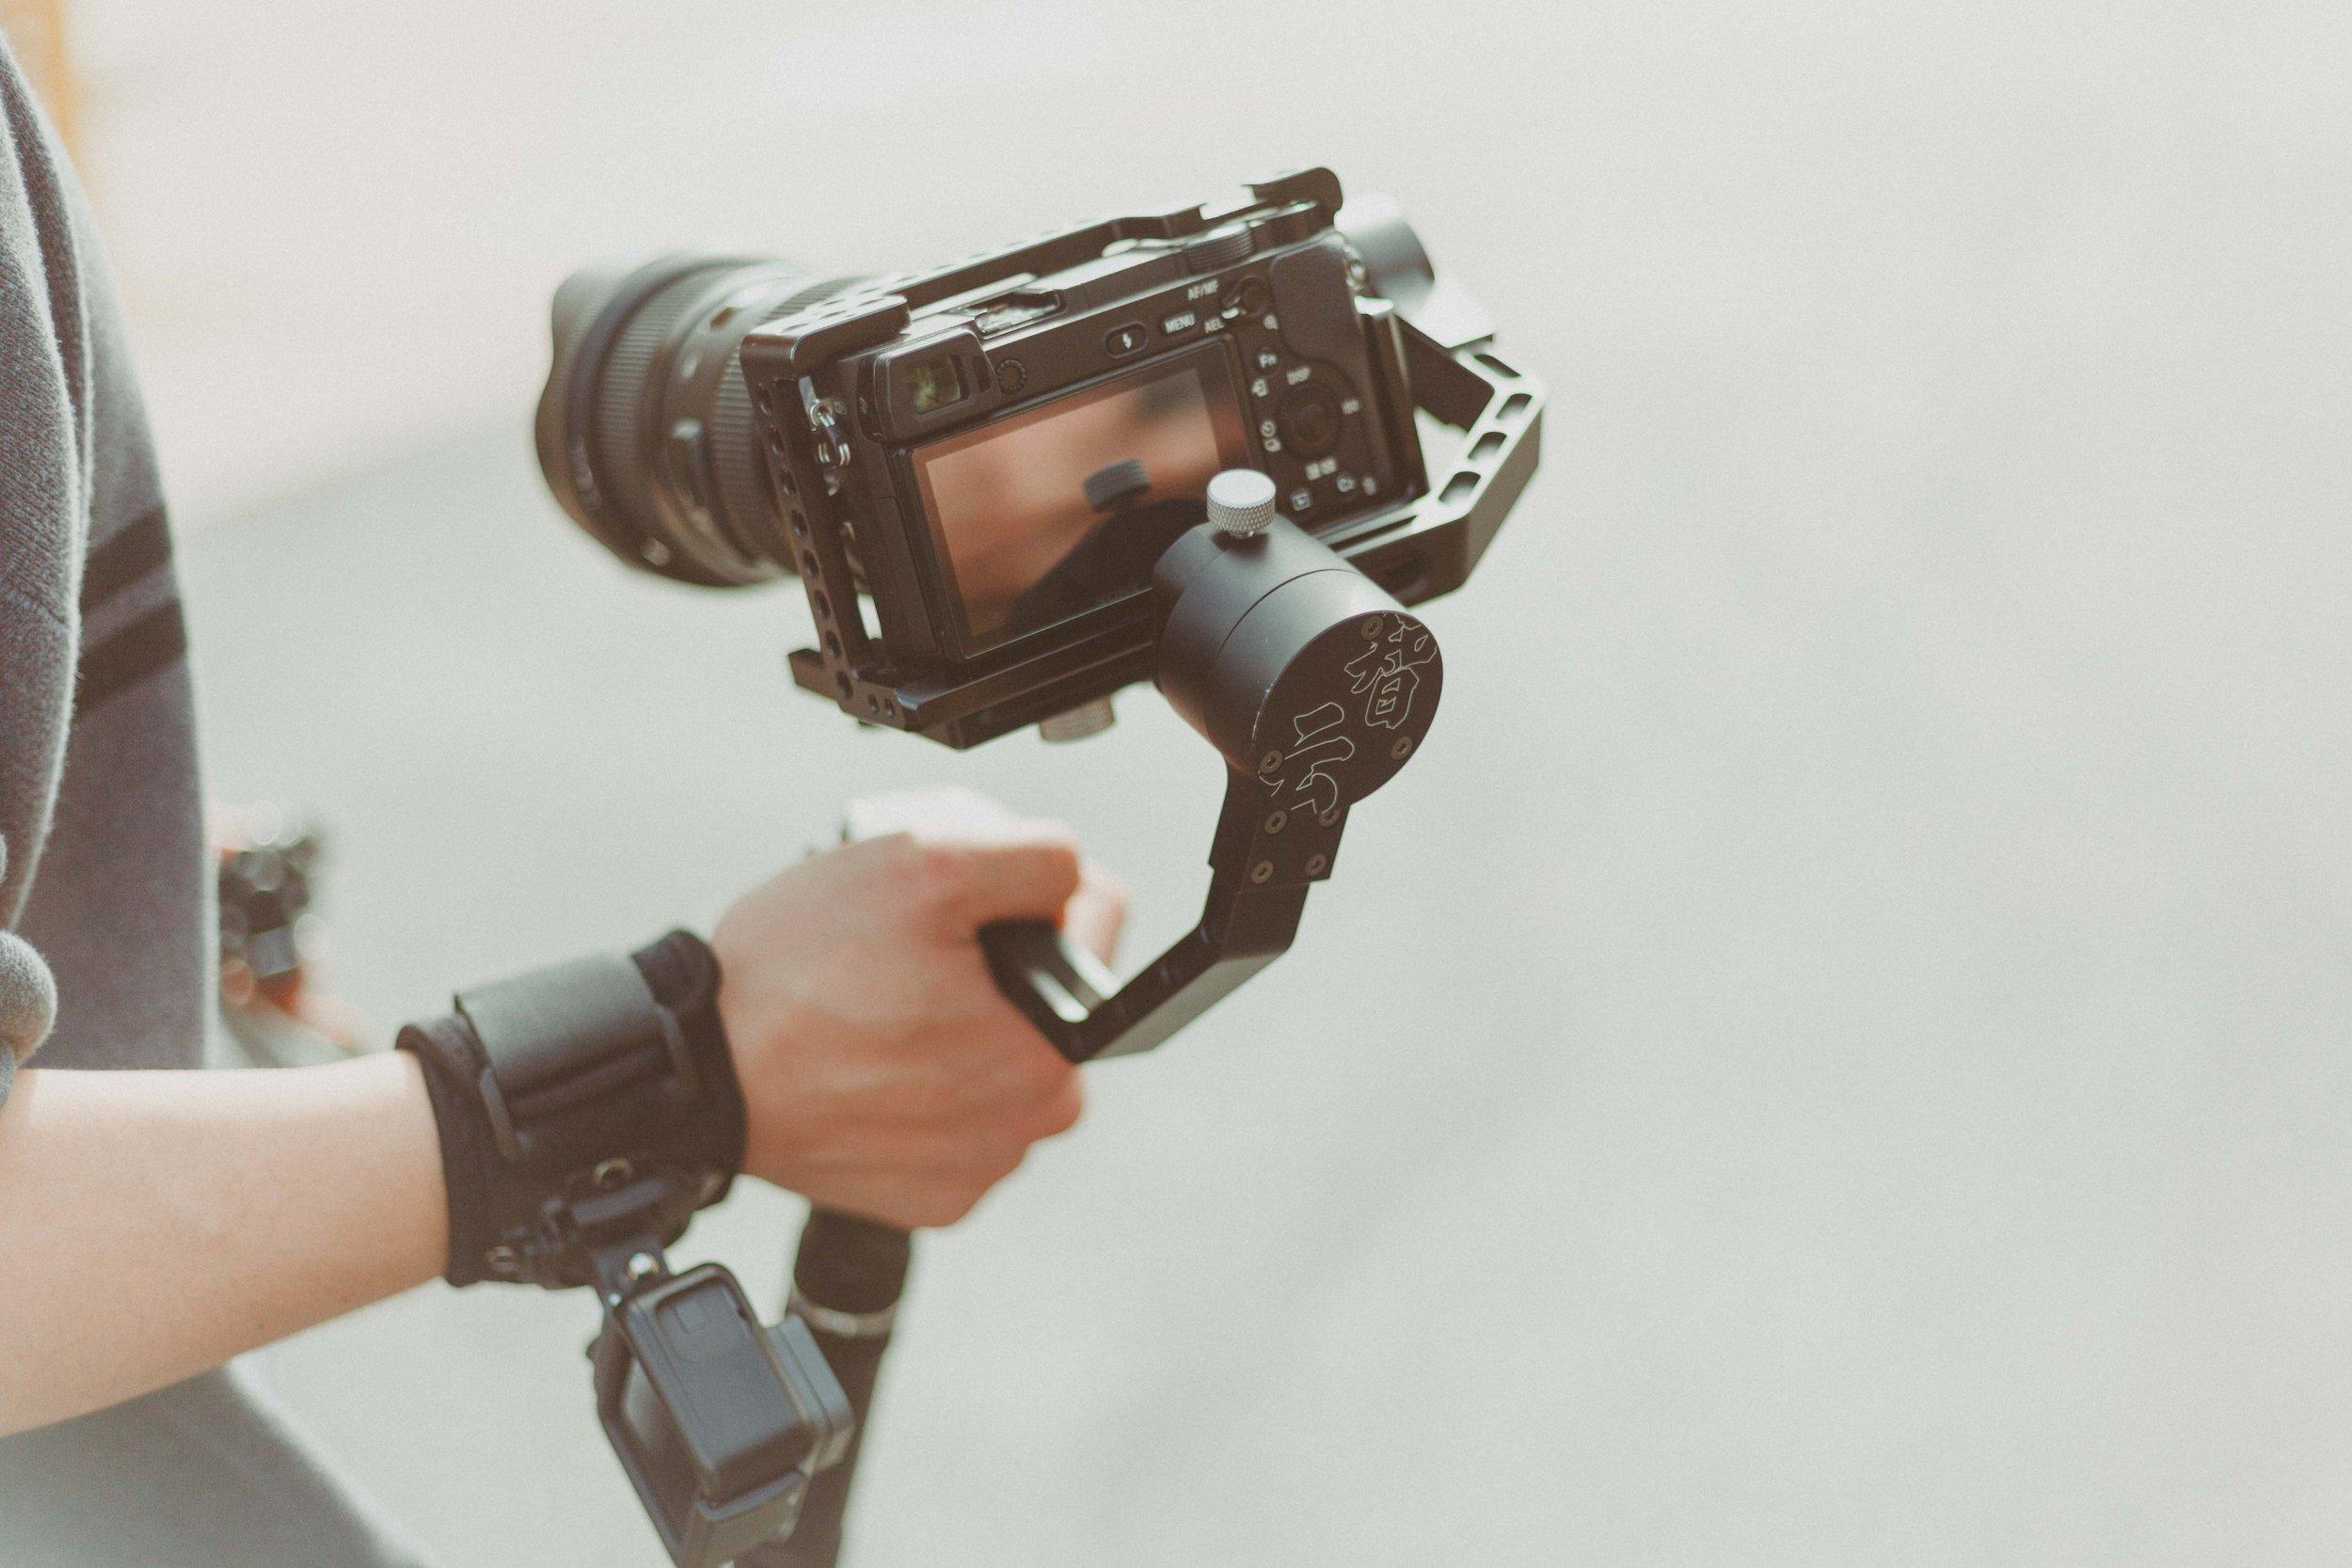 action-business-camera-1051544.jpg